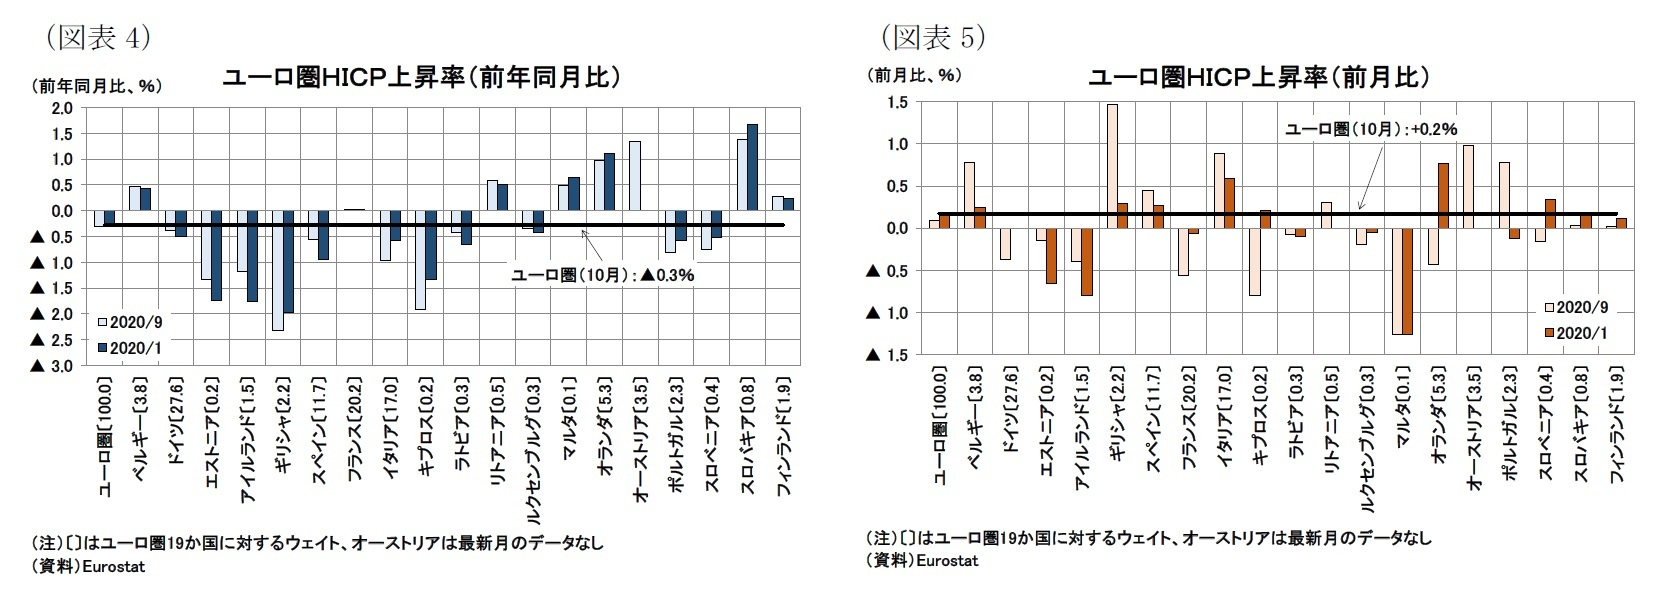 (図表4)ユーロ圏HICP上昇率(前年同月比)/(図表5)ユーロ圏HICP上昇率(前月比)